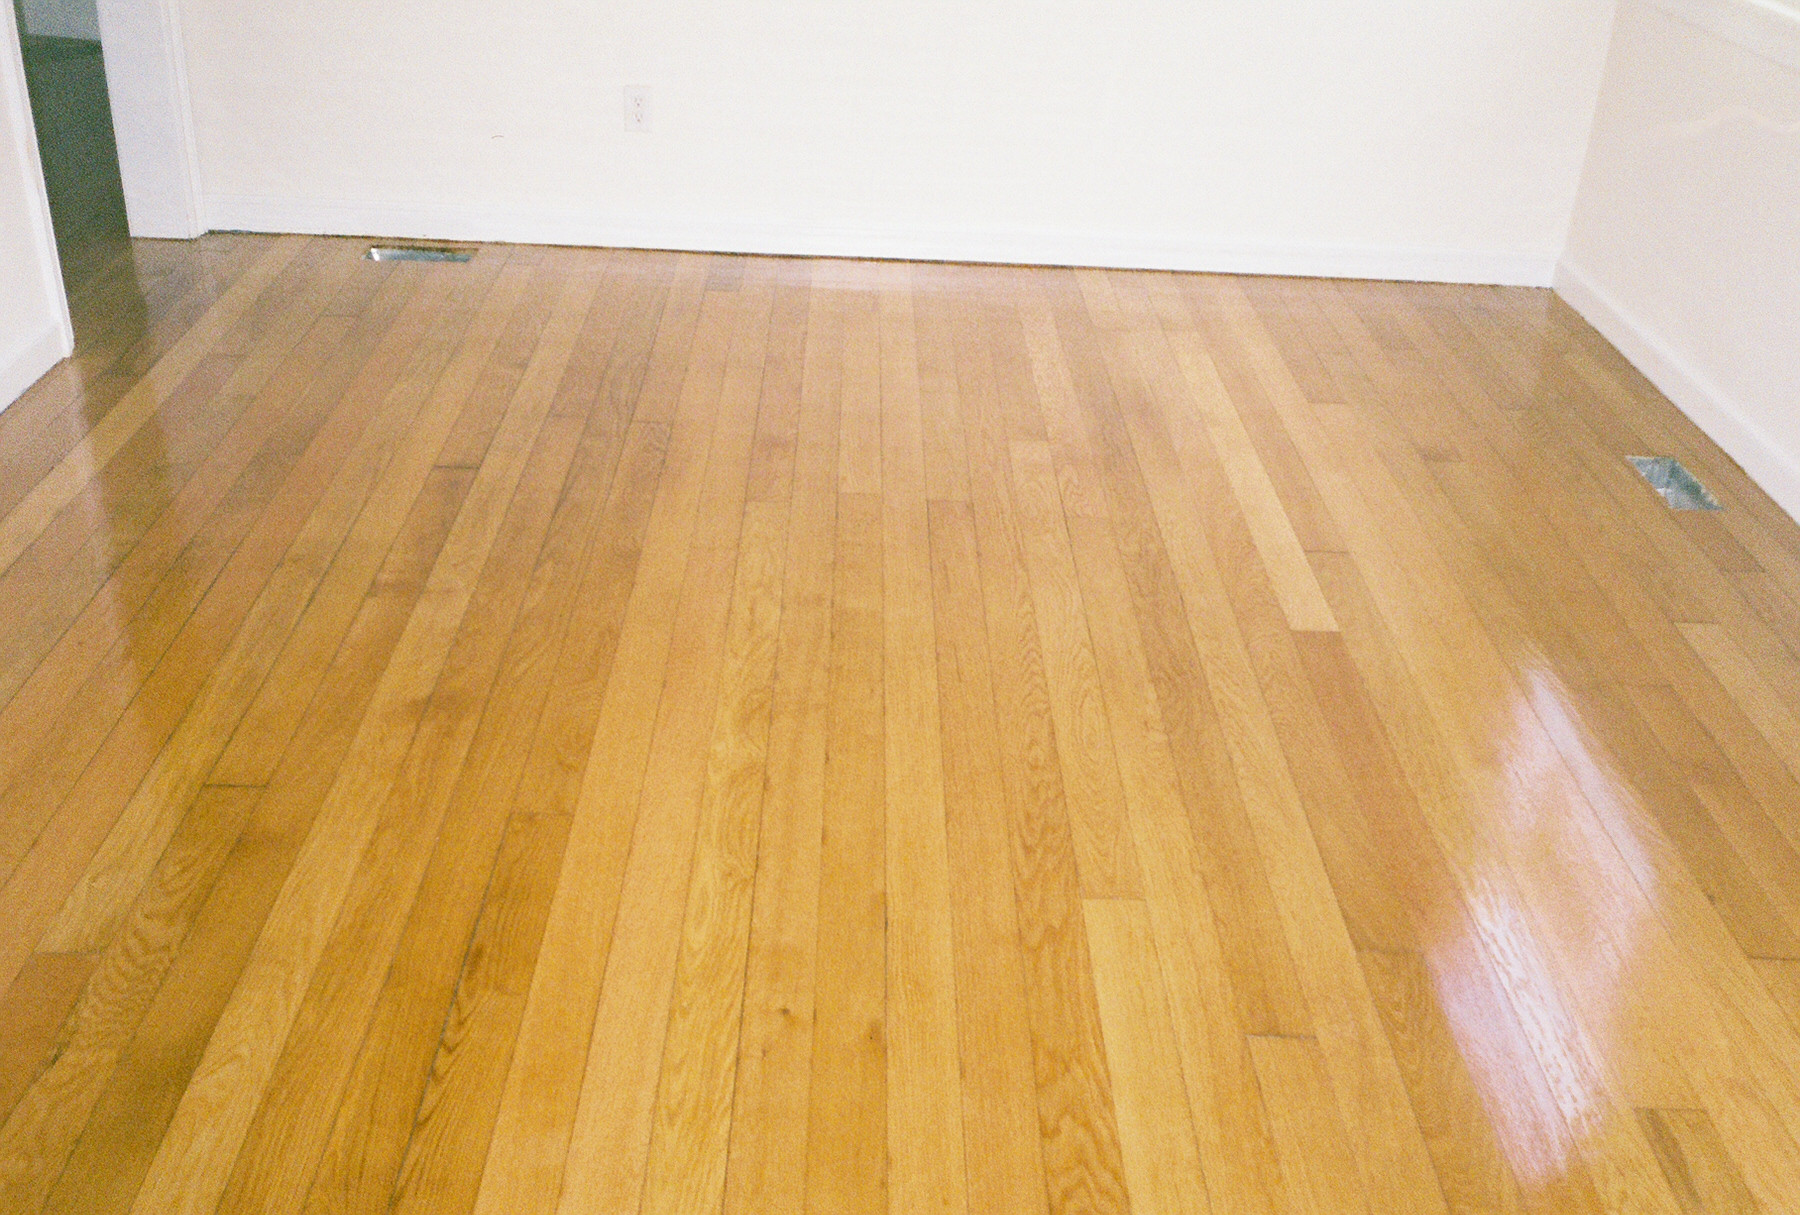 hardwood floor refinishing yorktown va of floor installationrepairsanding and refinishing specialists in throughout 757 585 8691